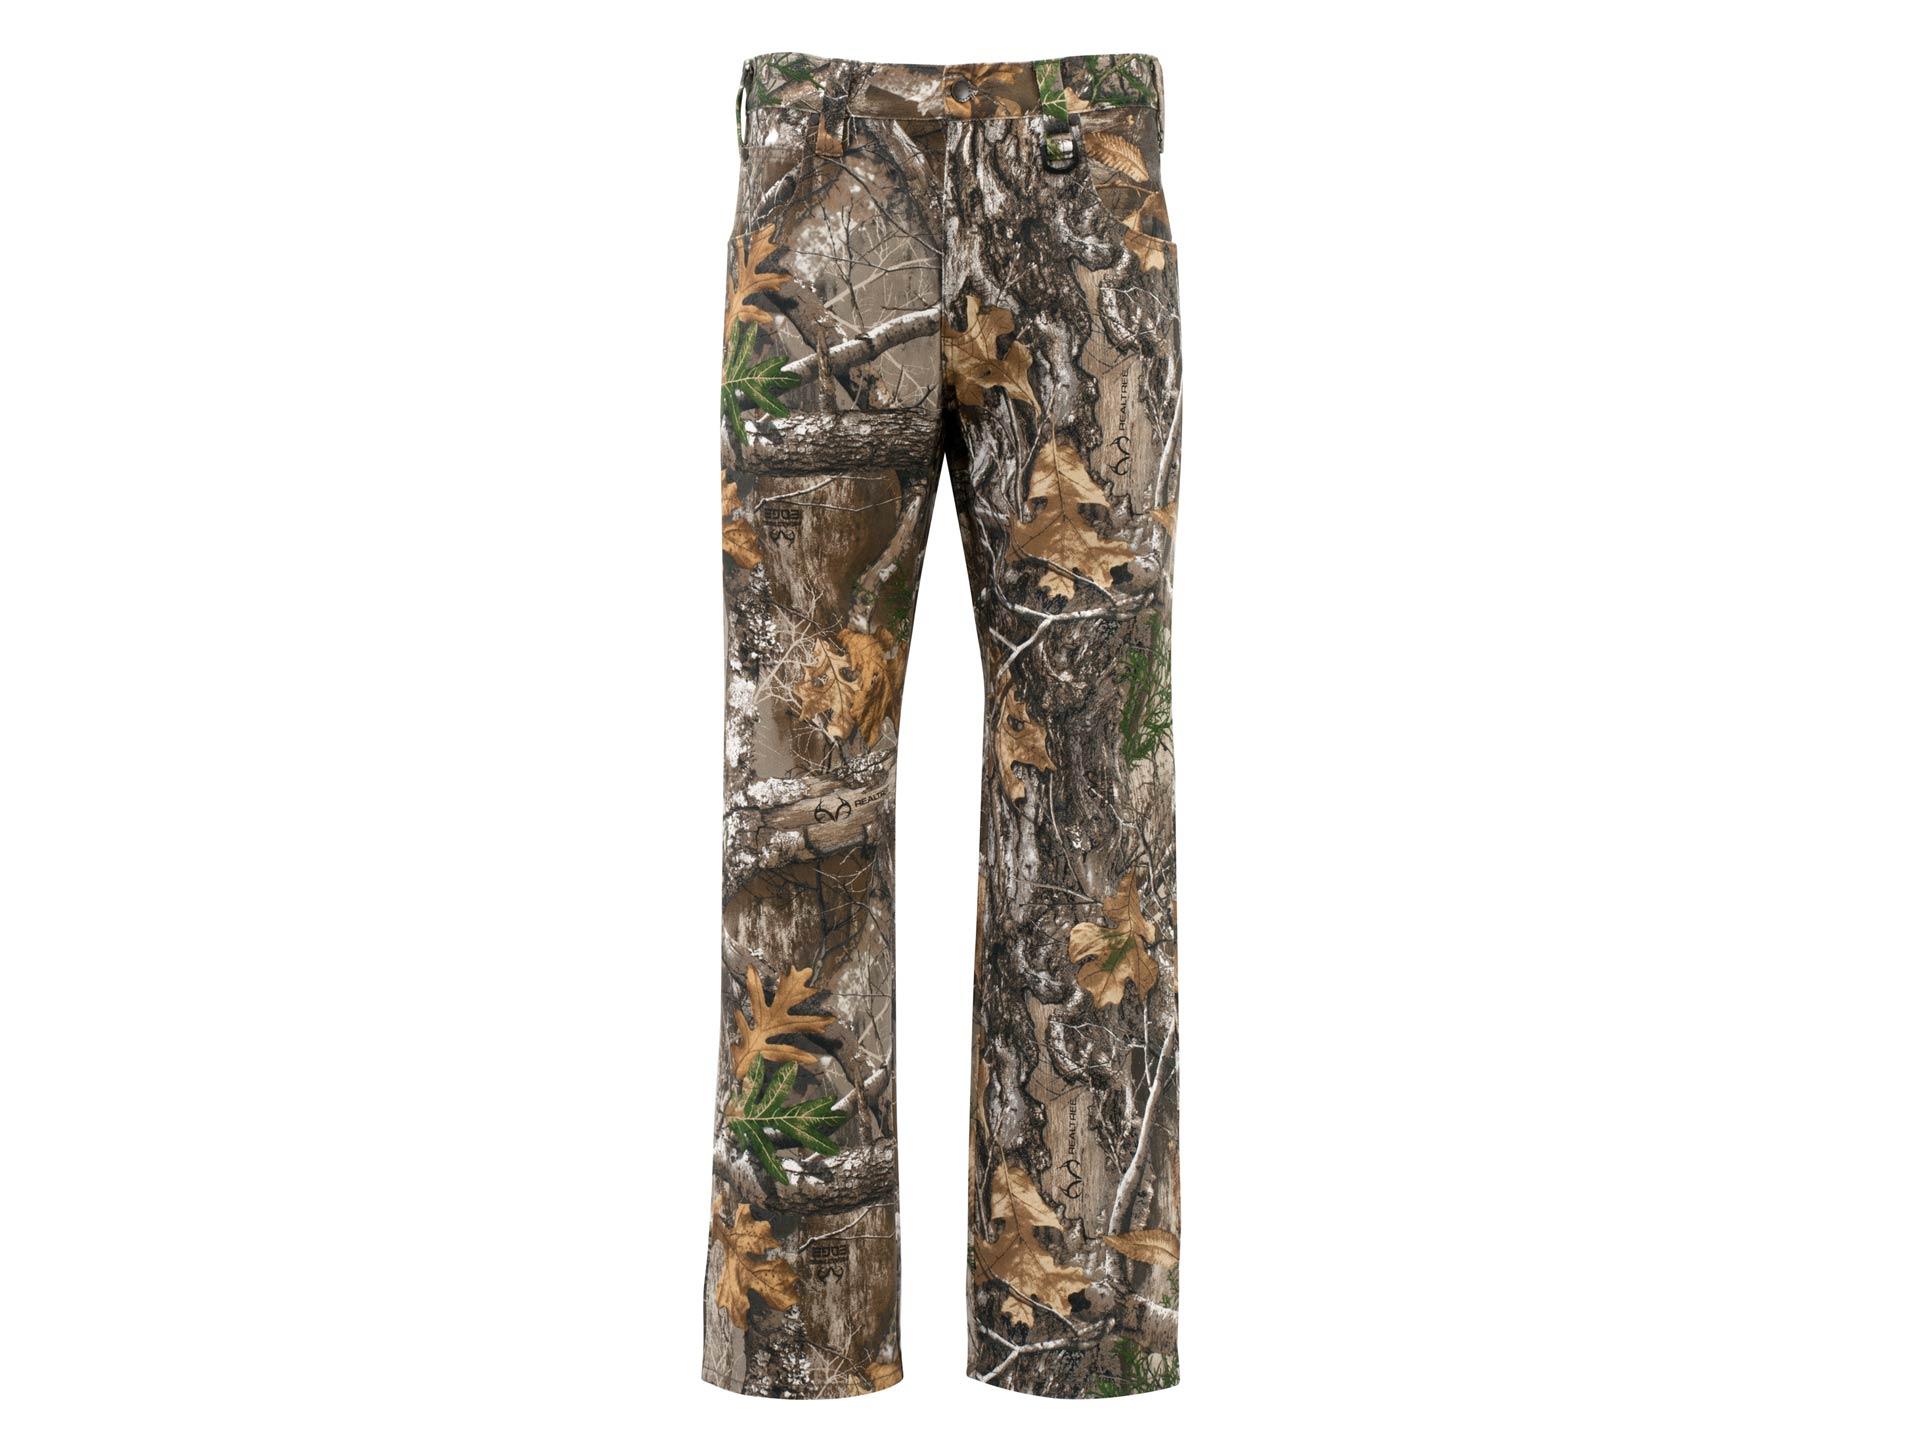 Realtree EDGE camouflage hunting pants